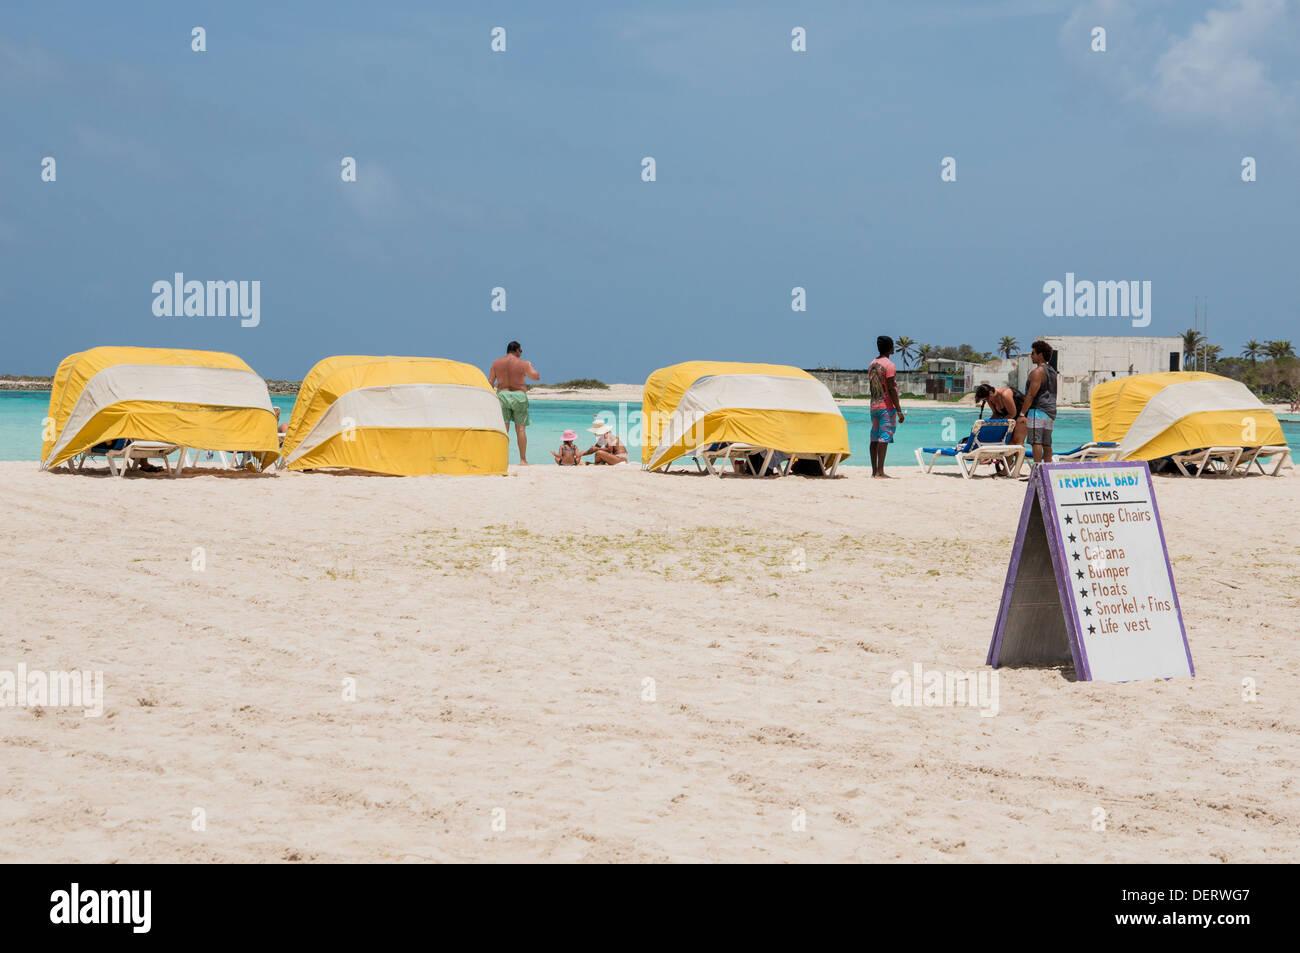 Stock Photo - sun tents on Baby Beach in Aruba  sc 1 st  Alamy & sun tents on Baby Beach in Aruba Stock Photo Royalty Free Image ...